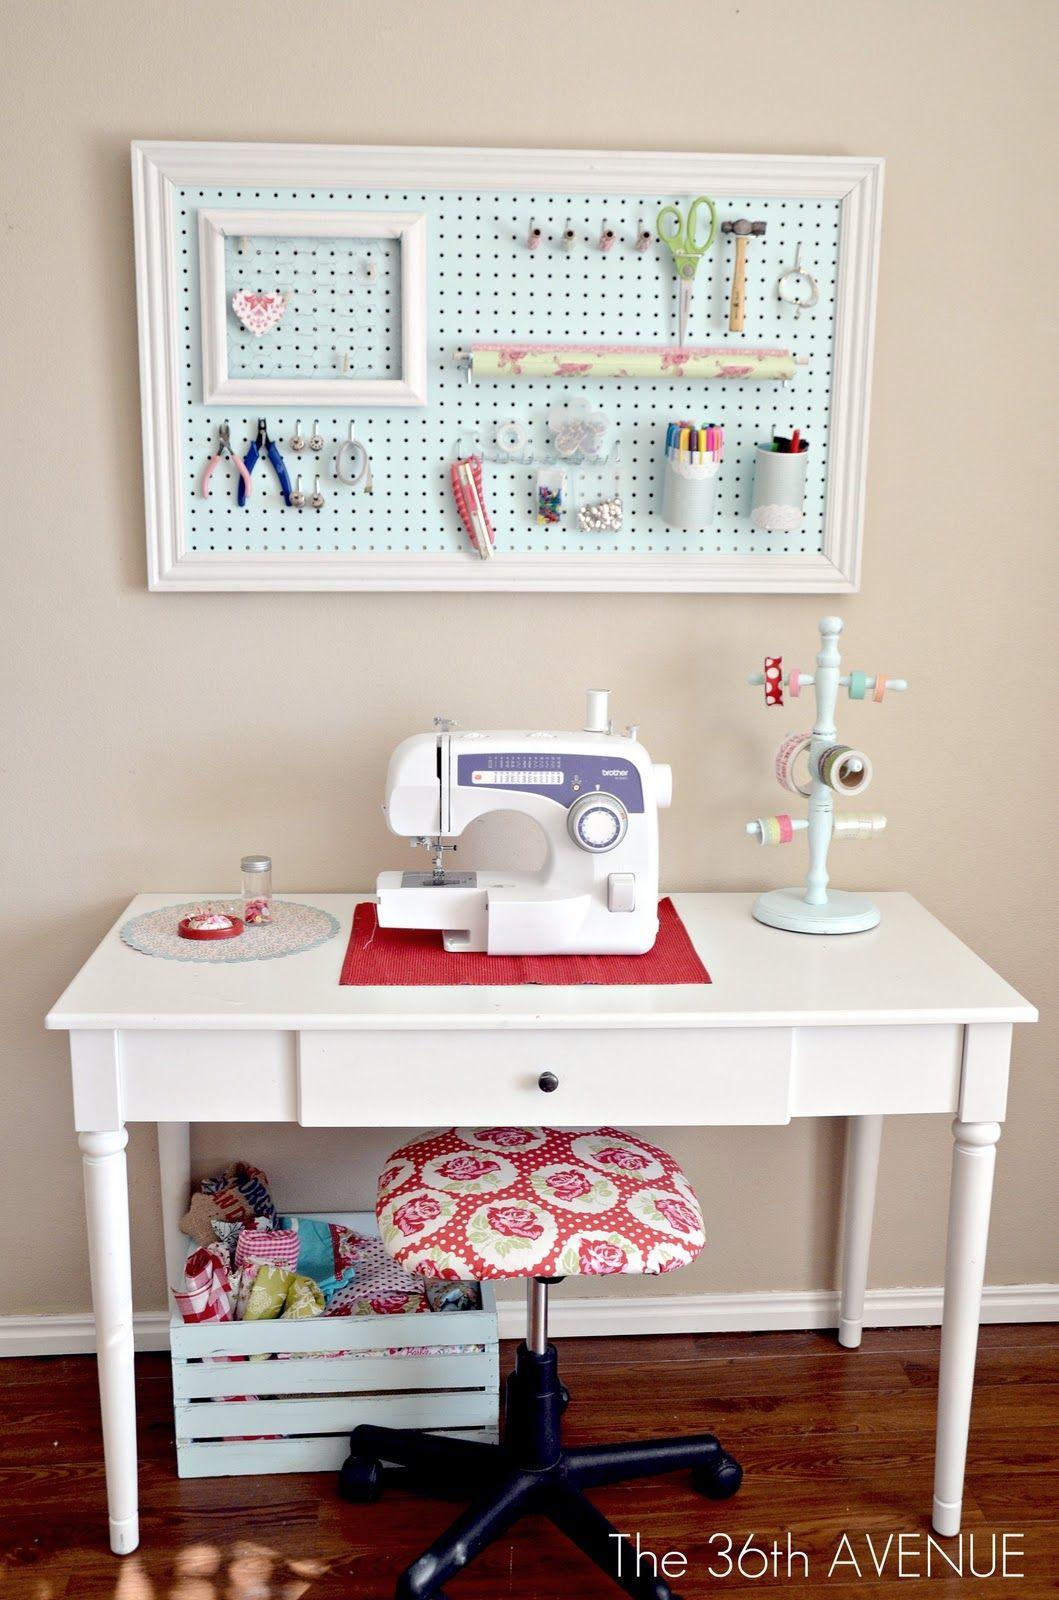 Designing A Sewing Room: Bastelzimmer Organisieren, Hobby